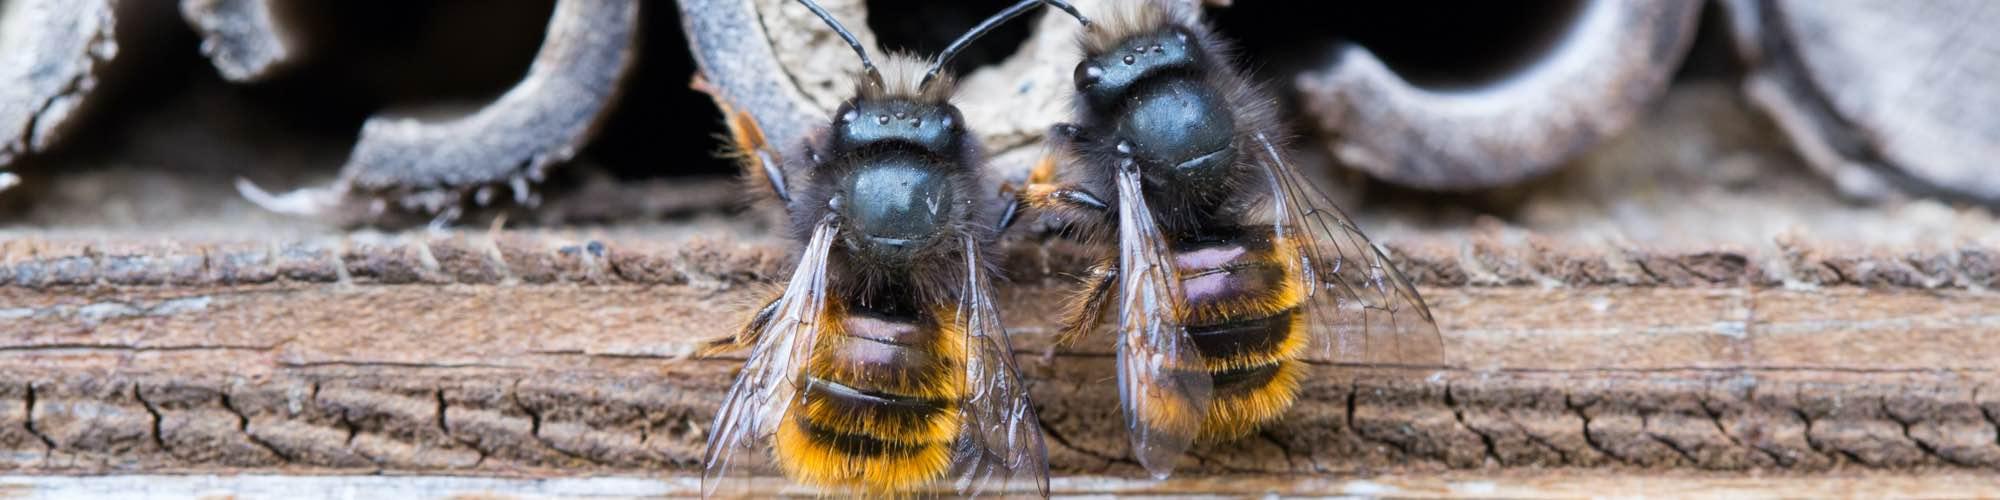 Bienenhotel Ratgeber